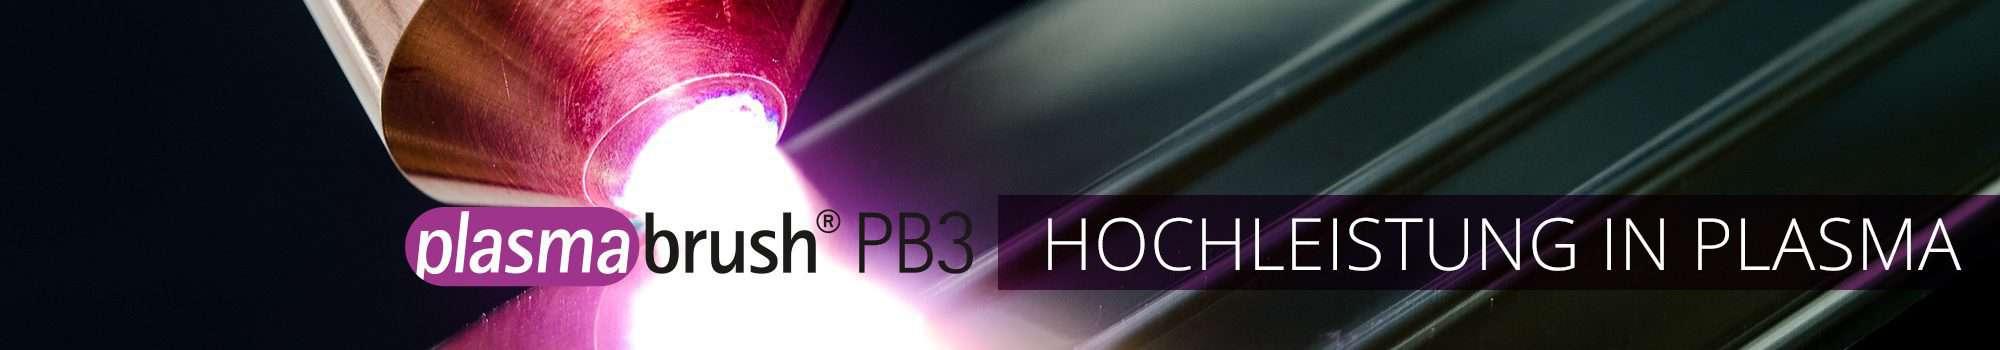 Plasmabrush PB3 High Performance Plasma Systeme